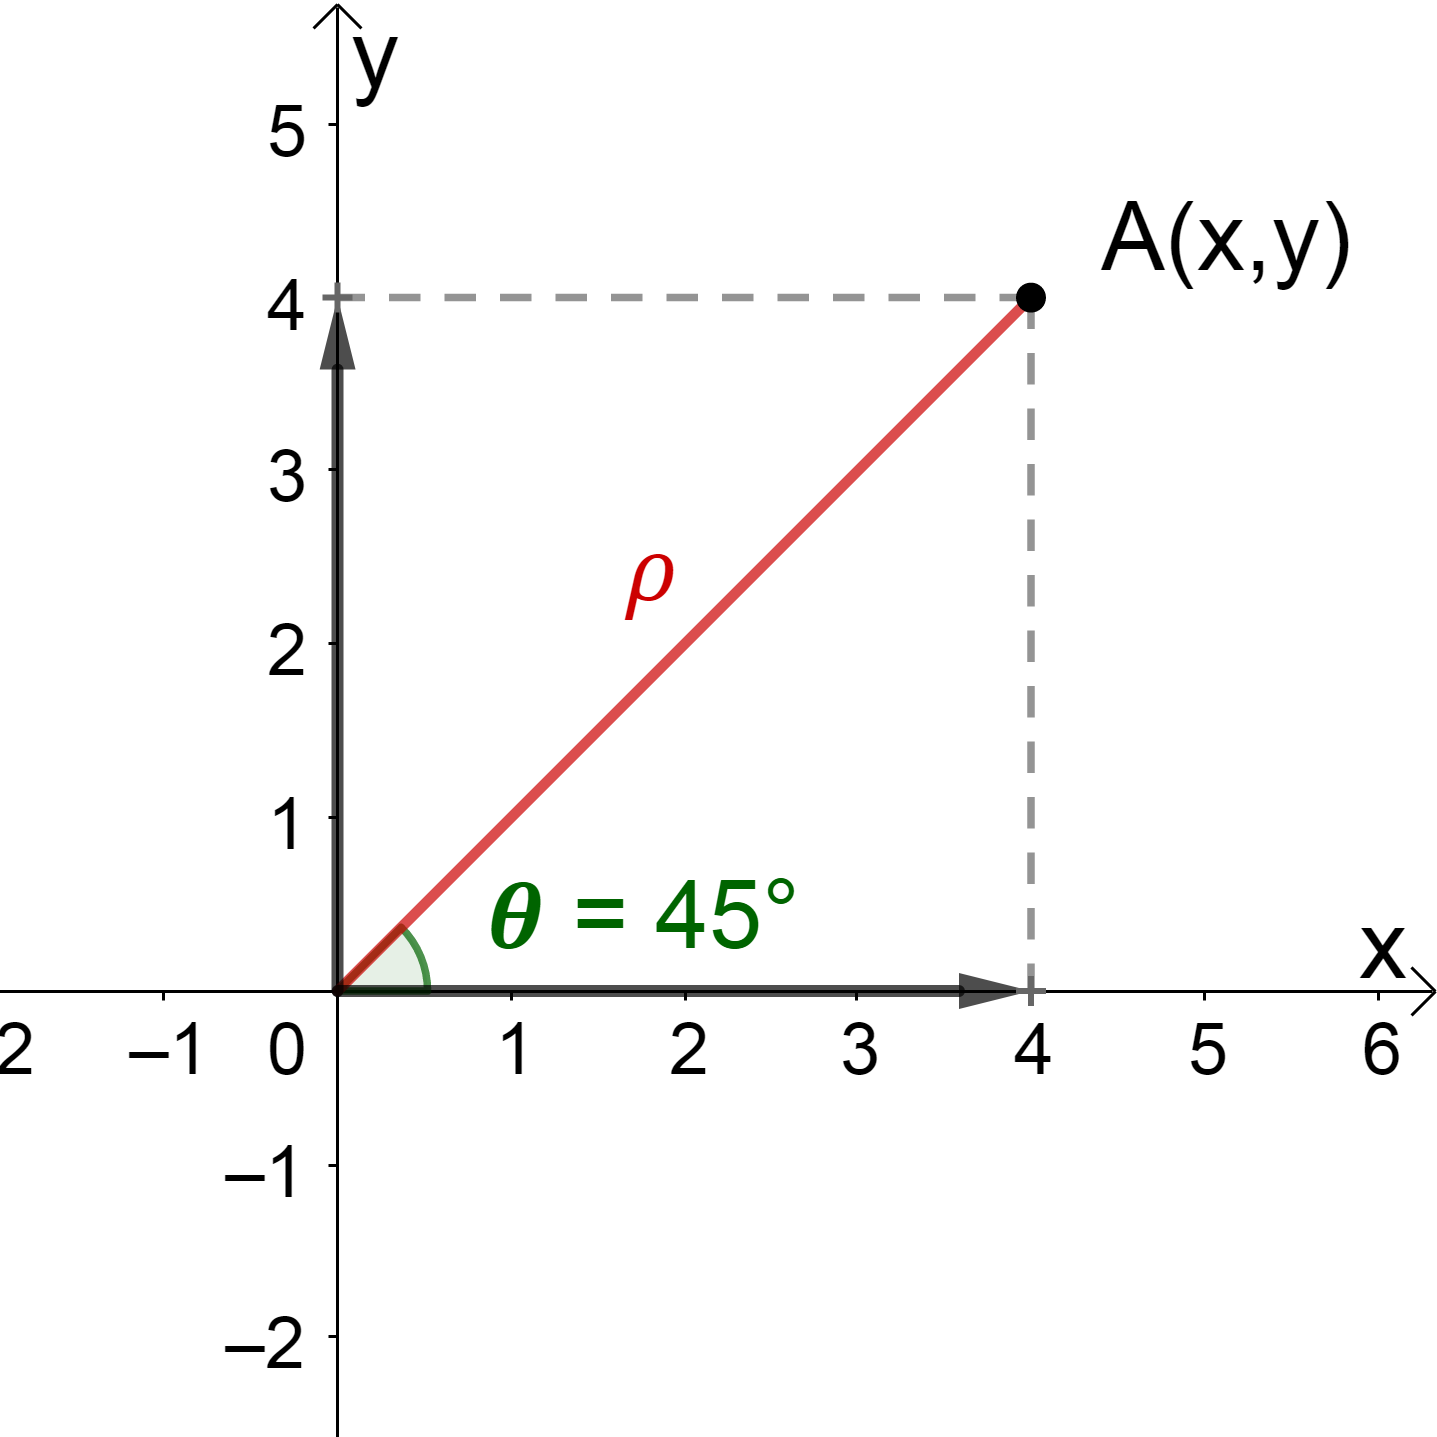 Plano de Arghan-Gauss (00029) Image